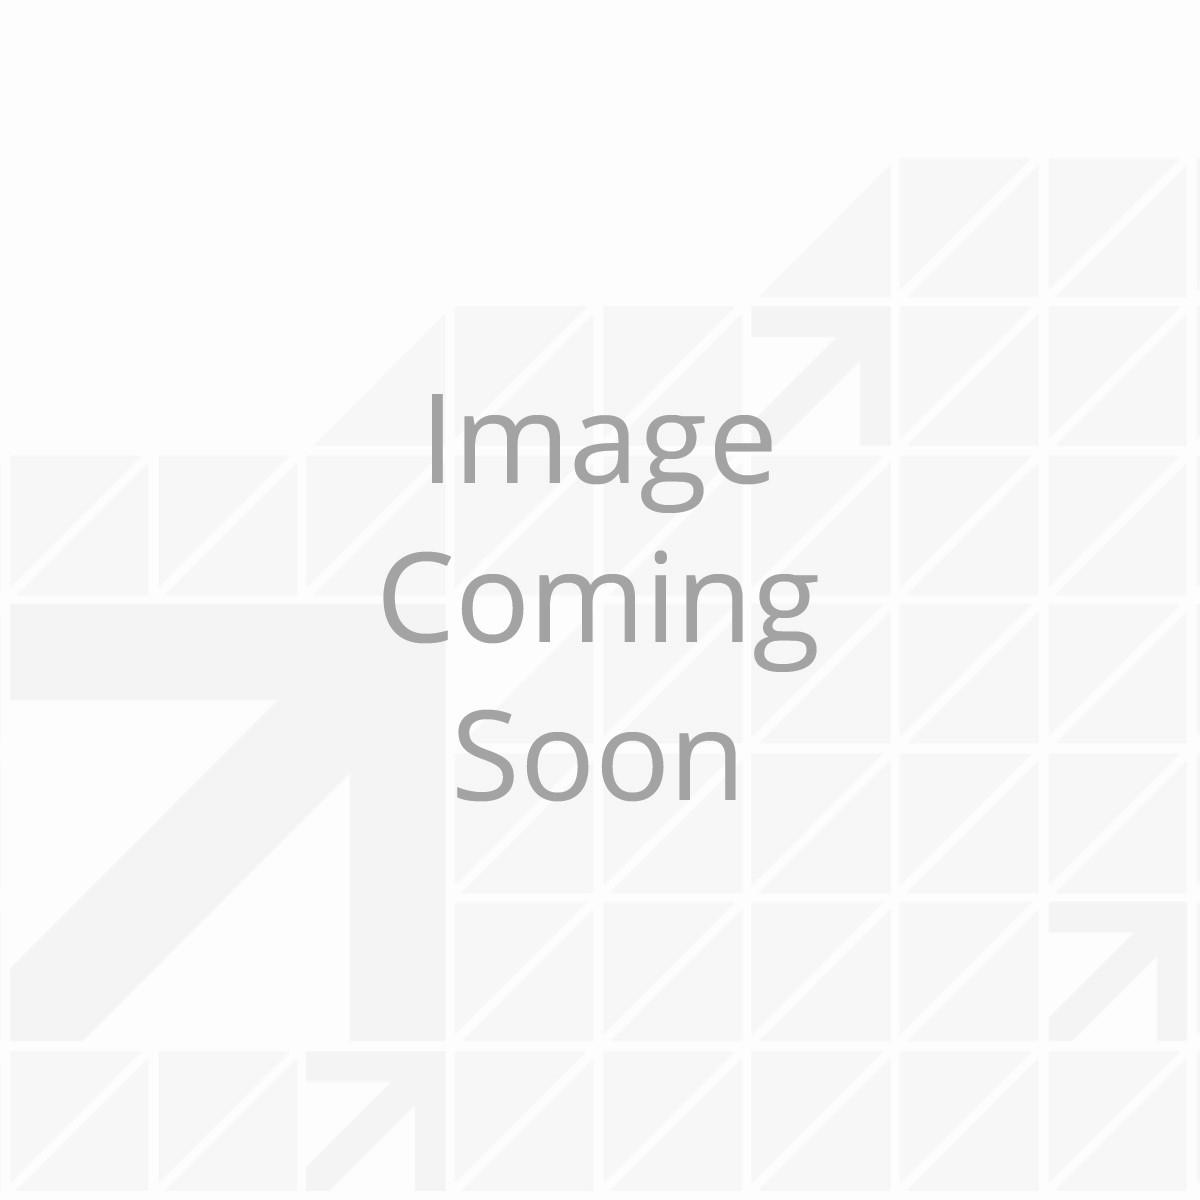 FT-CG07S Chevy/GMC Tiedown Kit